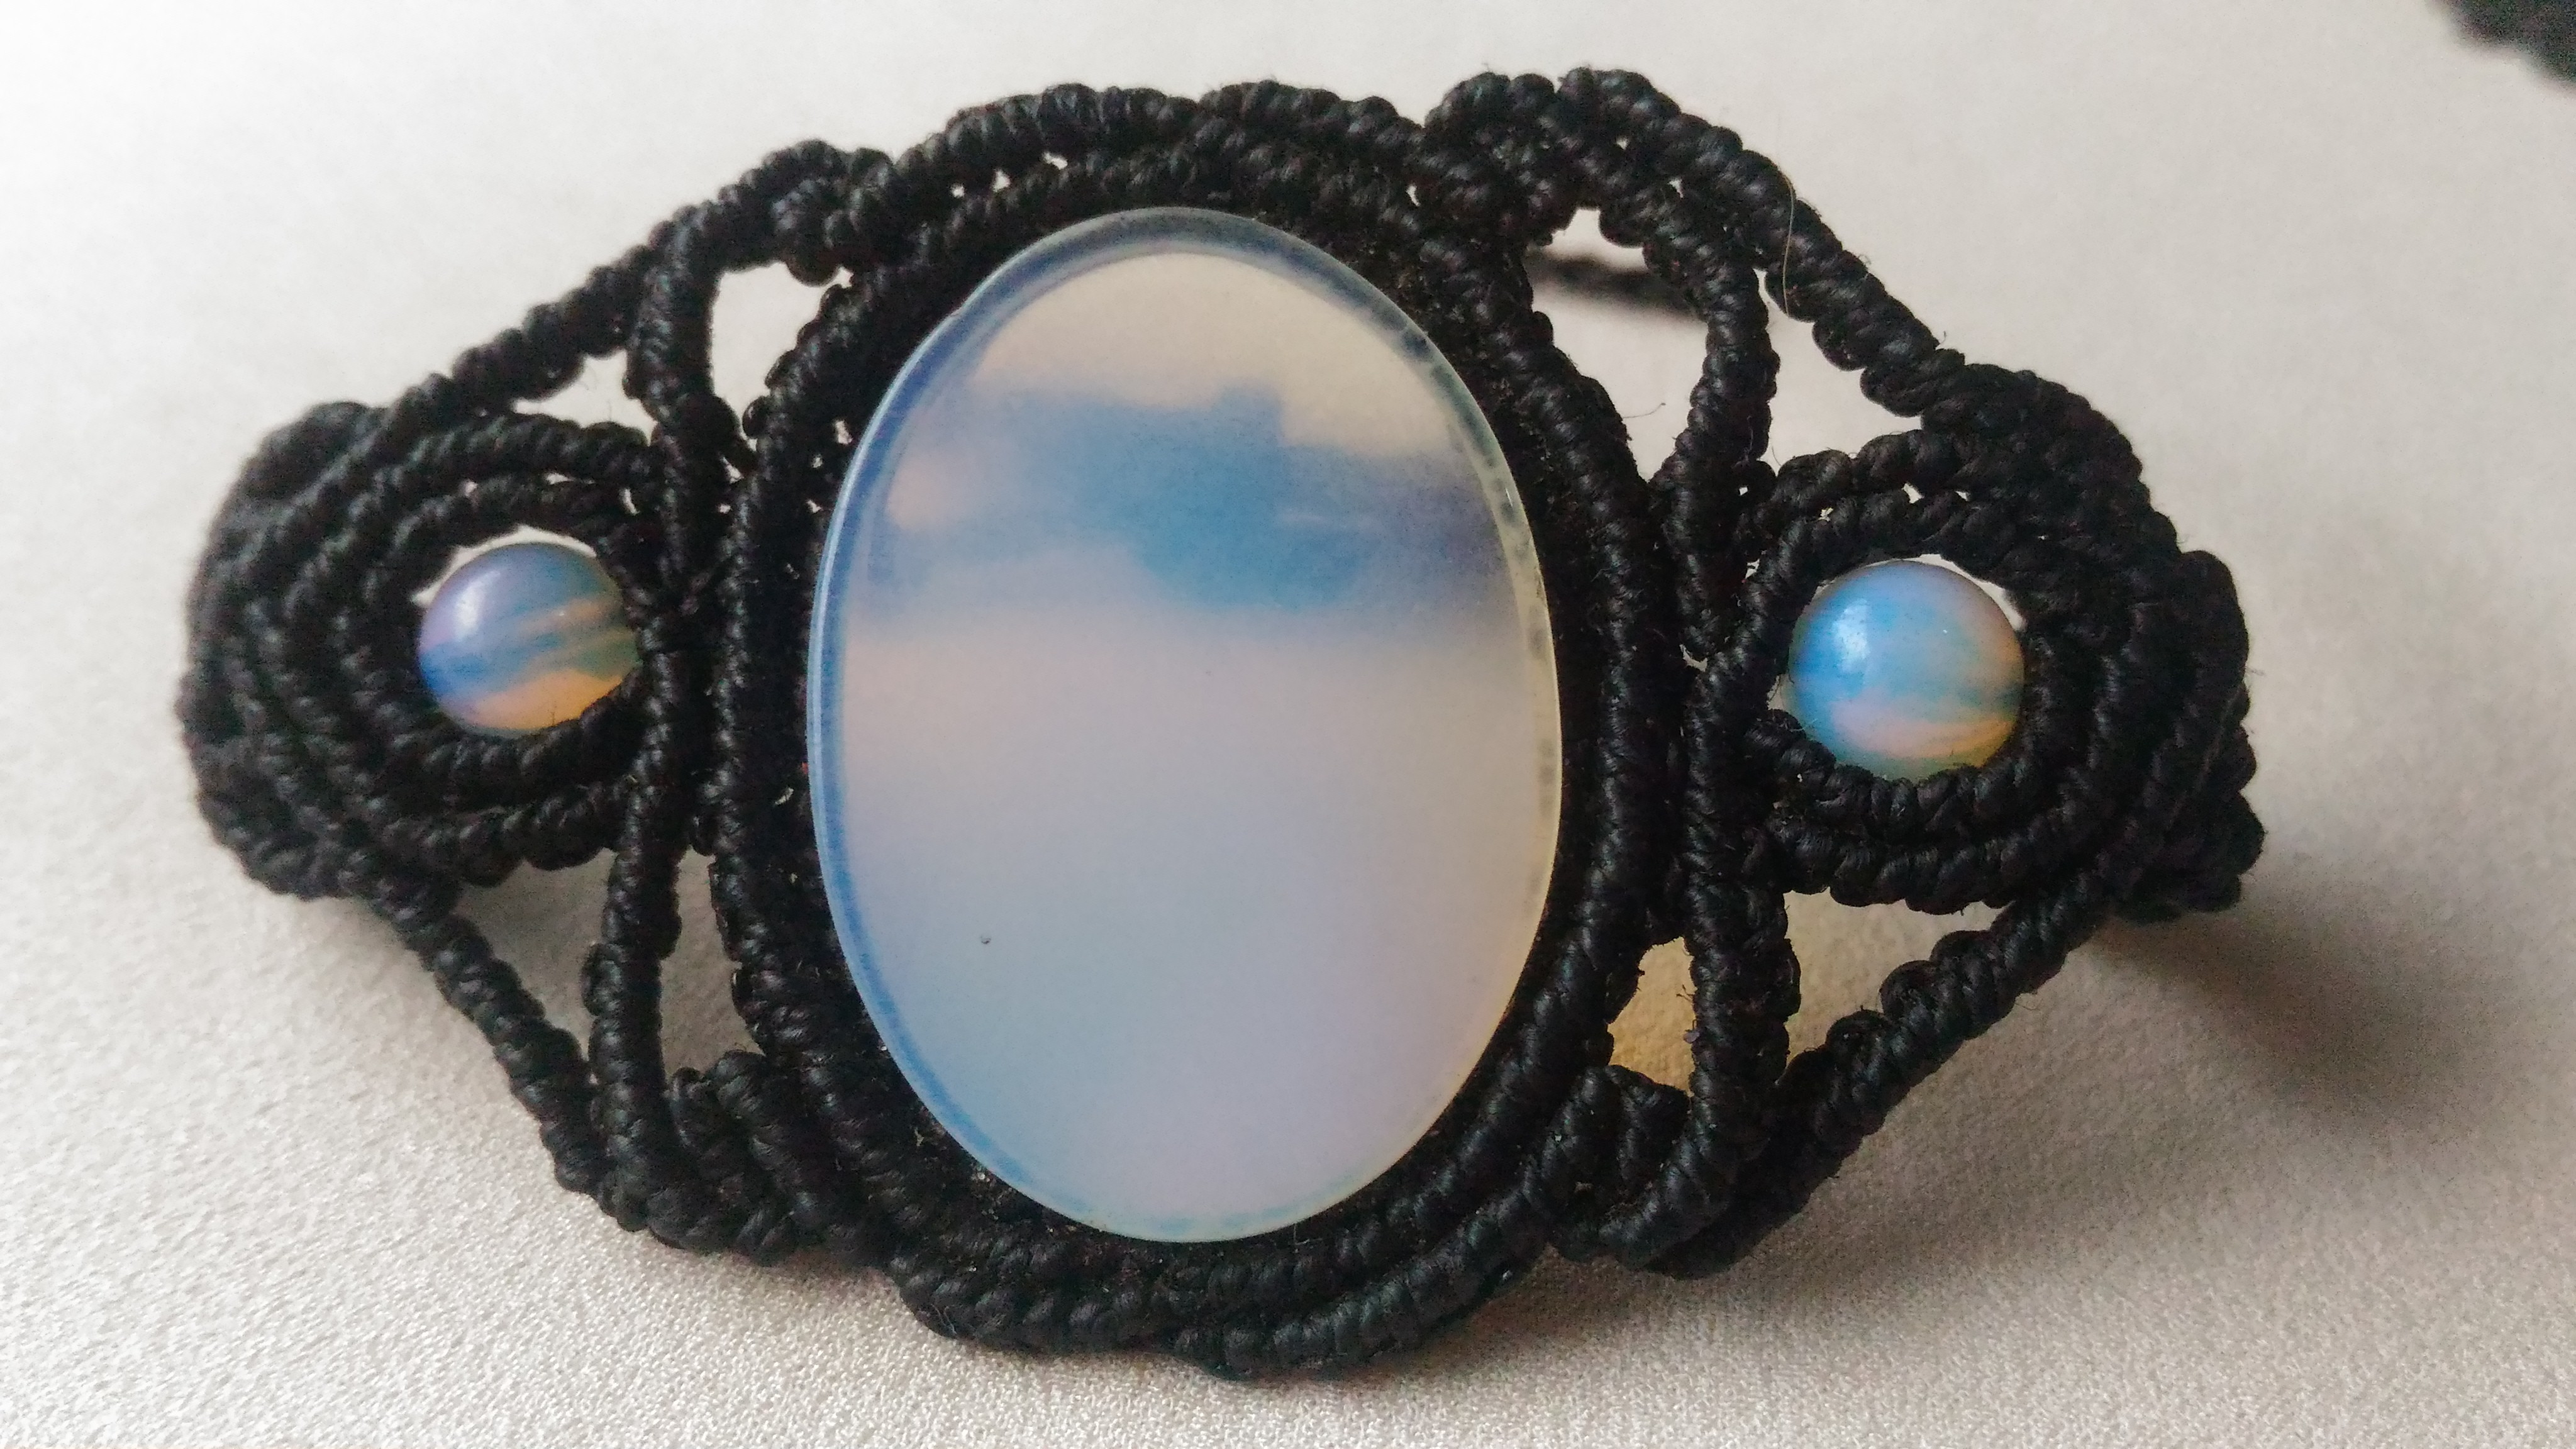 9b7e495d6a8 Bracelete Artesanal Magico Ser da Lua